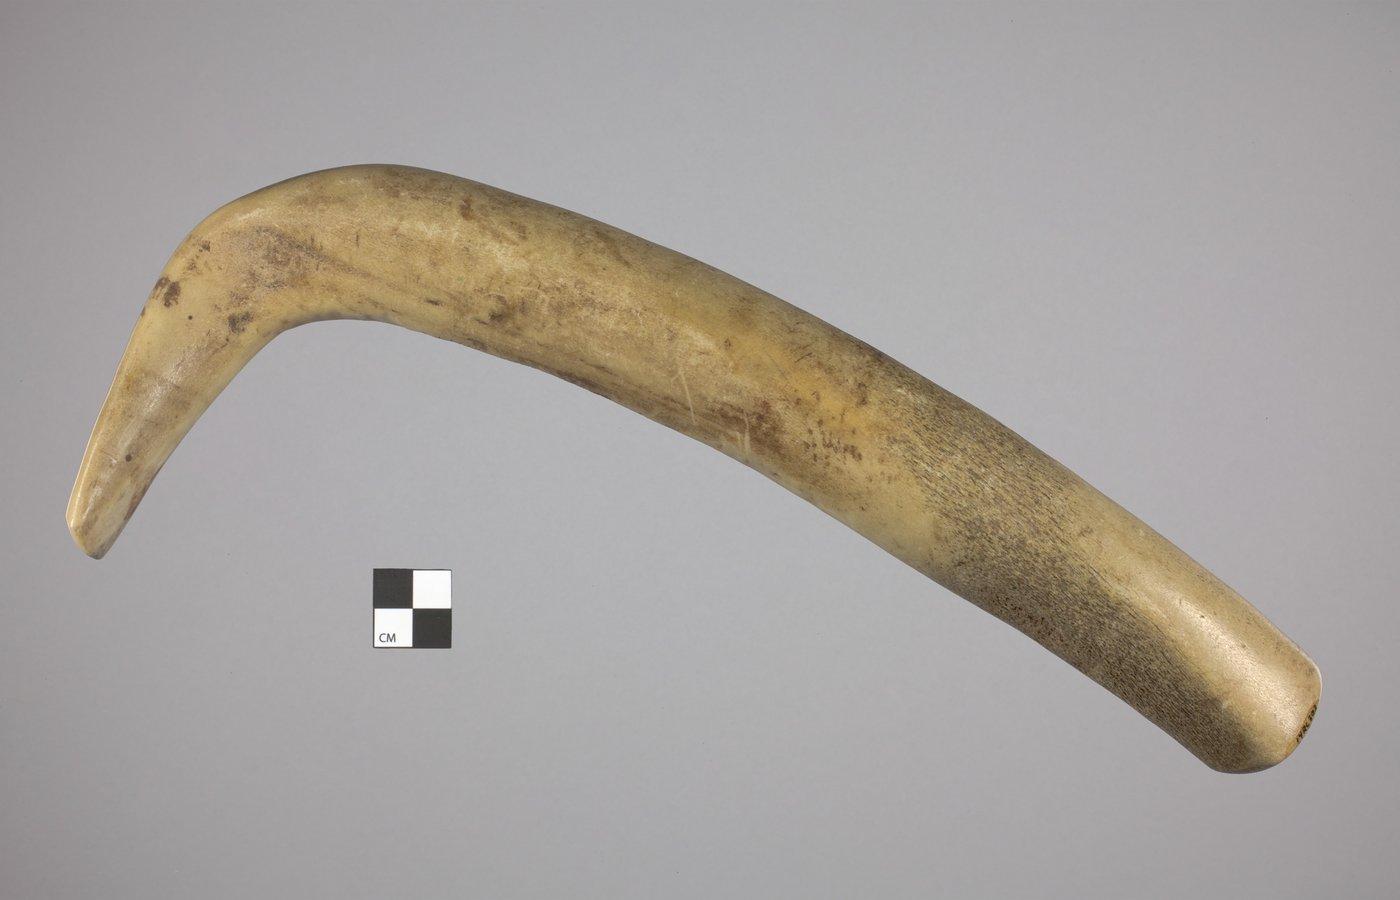 Elk Antler Scraper Handle from the Thompson Site, 14RC9 - 2